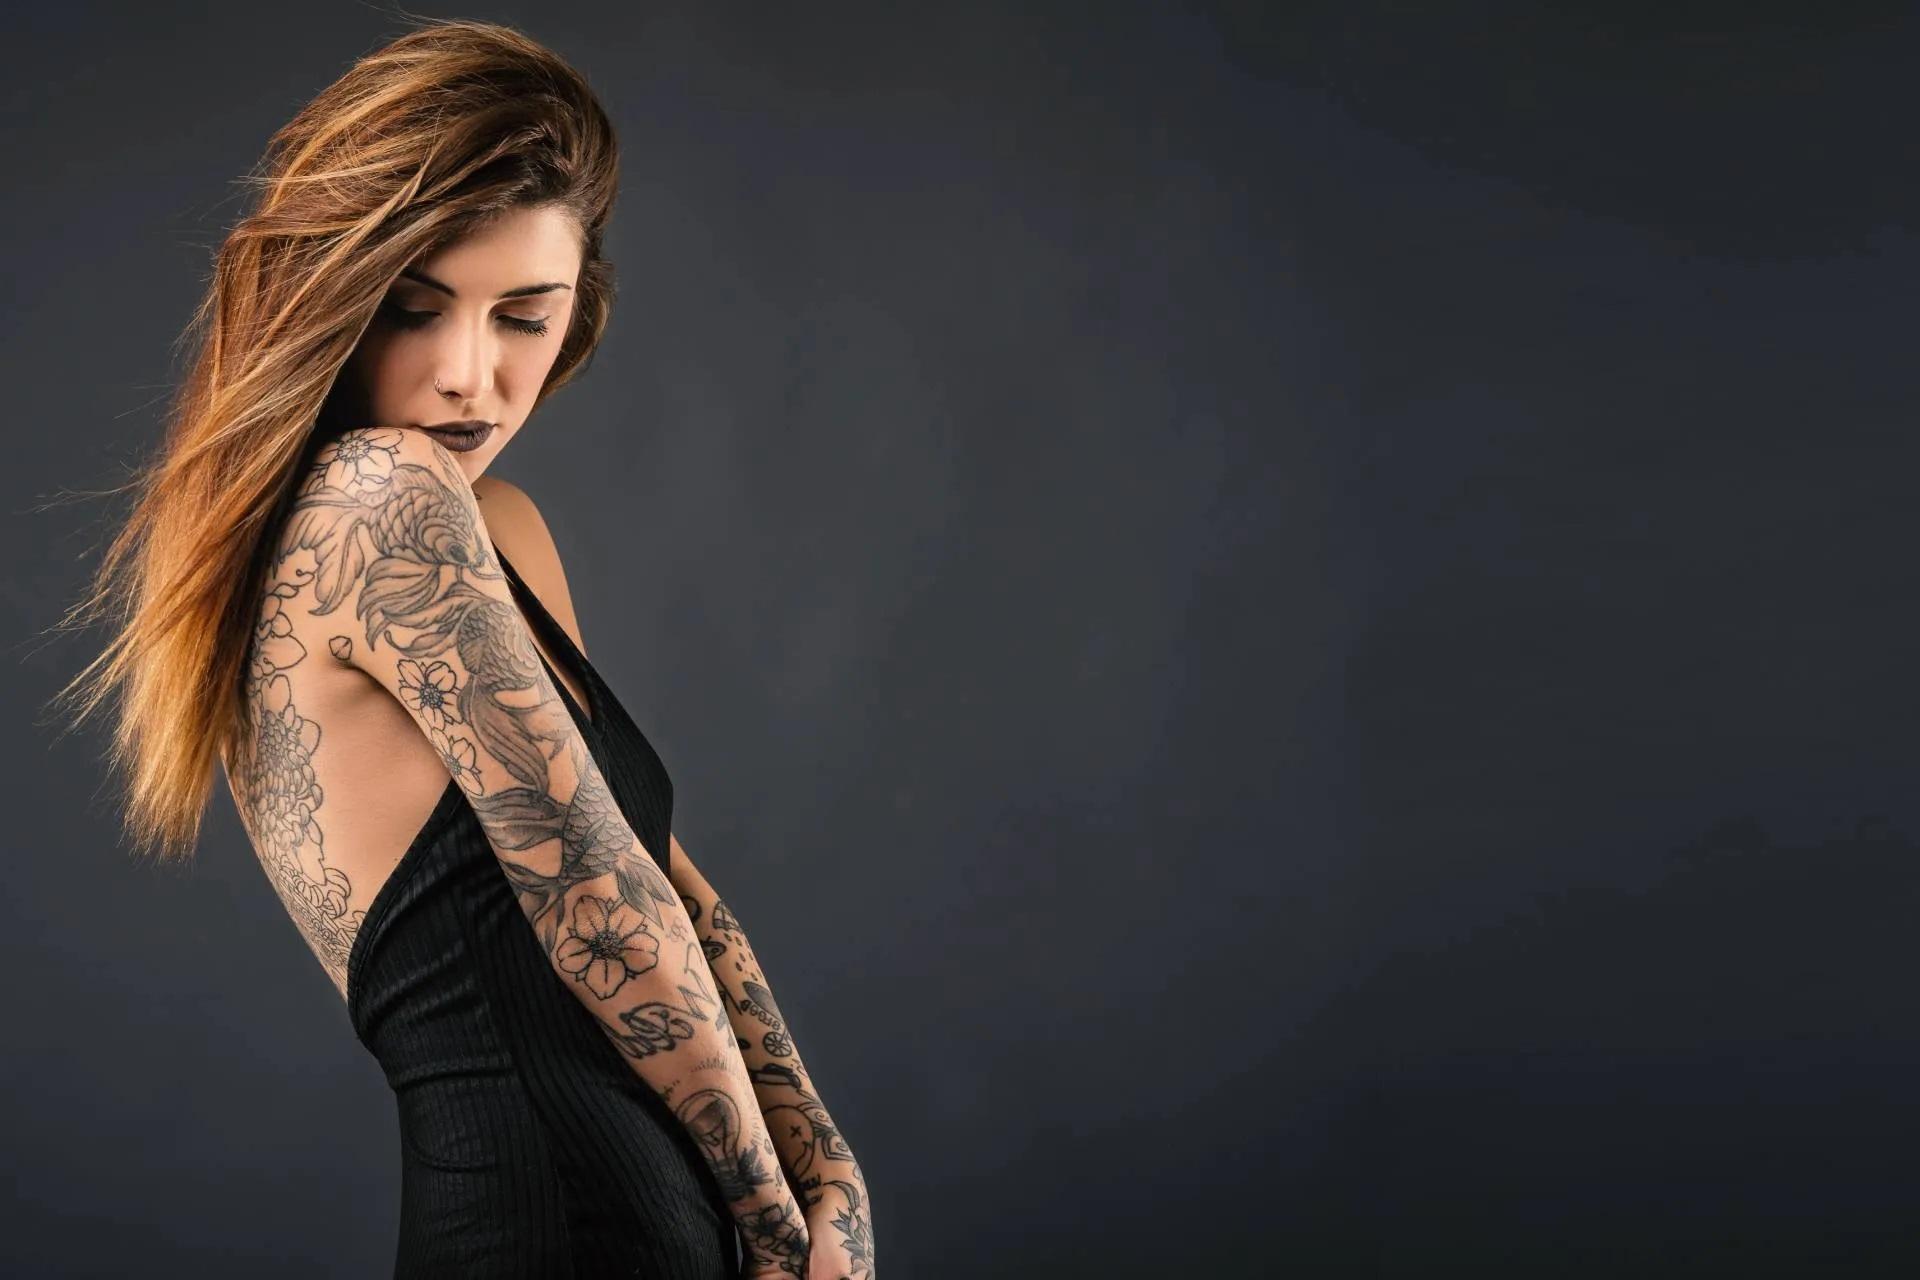 Tatuaggio black & gray perugia